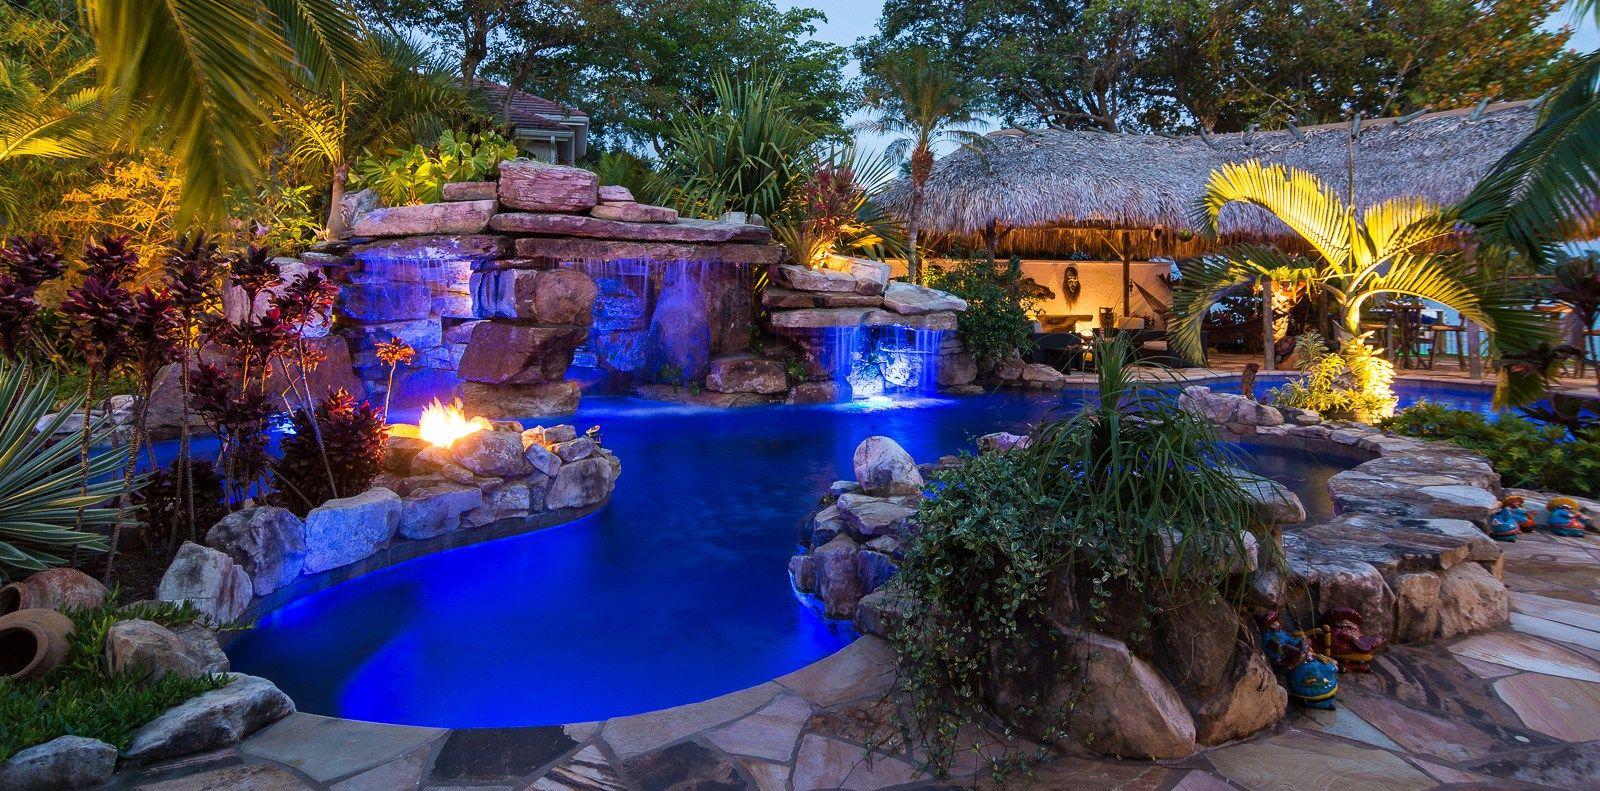 Natural Rock Waterfall Pool Siesta Key Custom Pools With Tiki Hut Custom Pools Amazing Swimming Pools Dream Backyard Pool